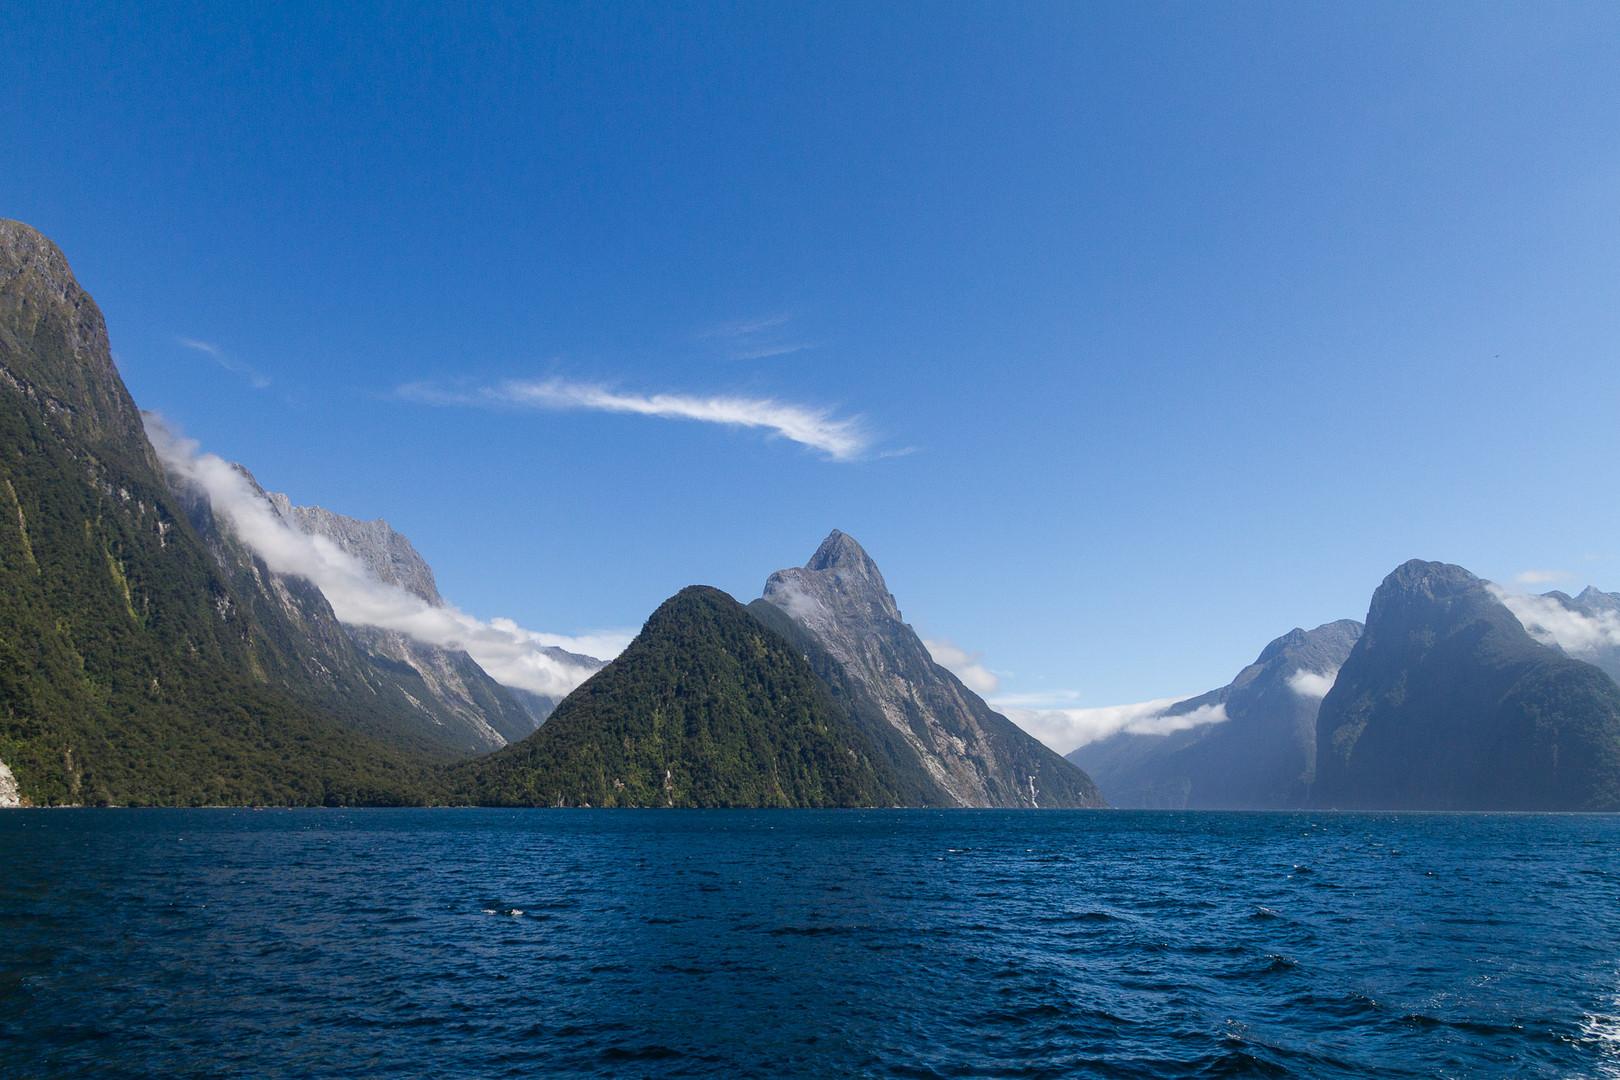 Milford Sound im Fjordland National Park, Neuseeland